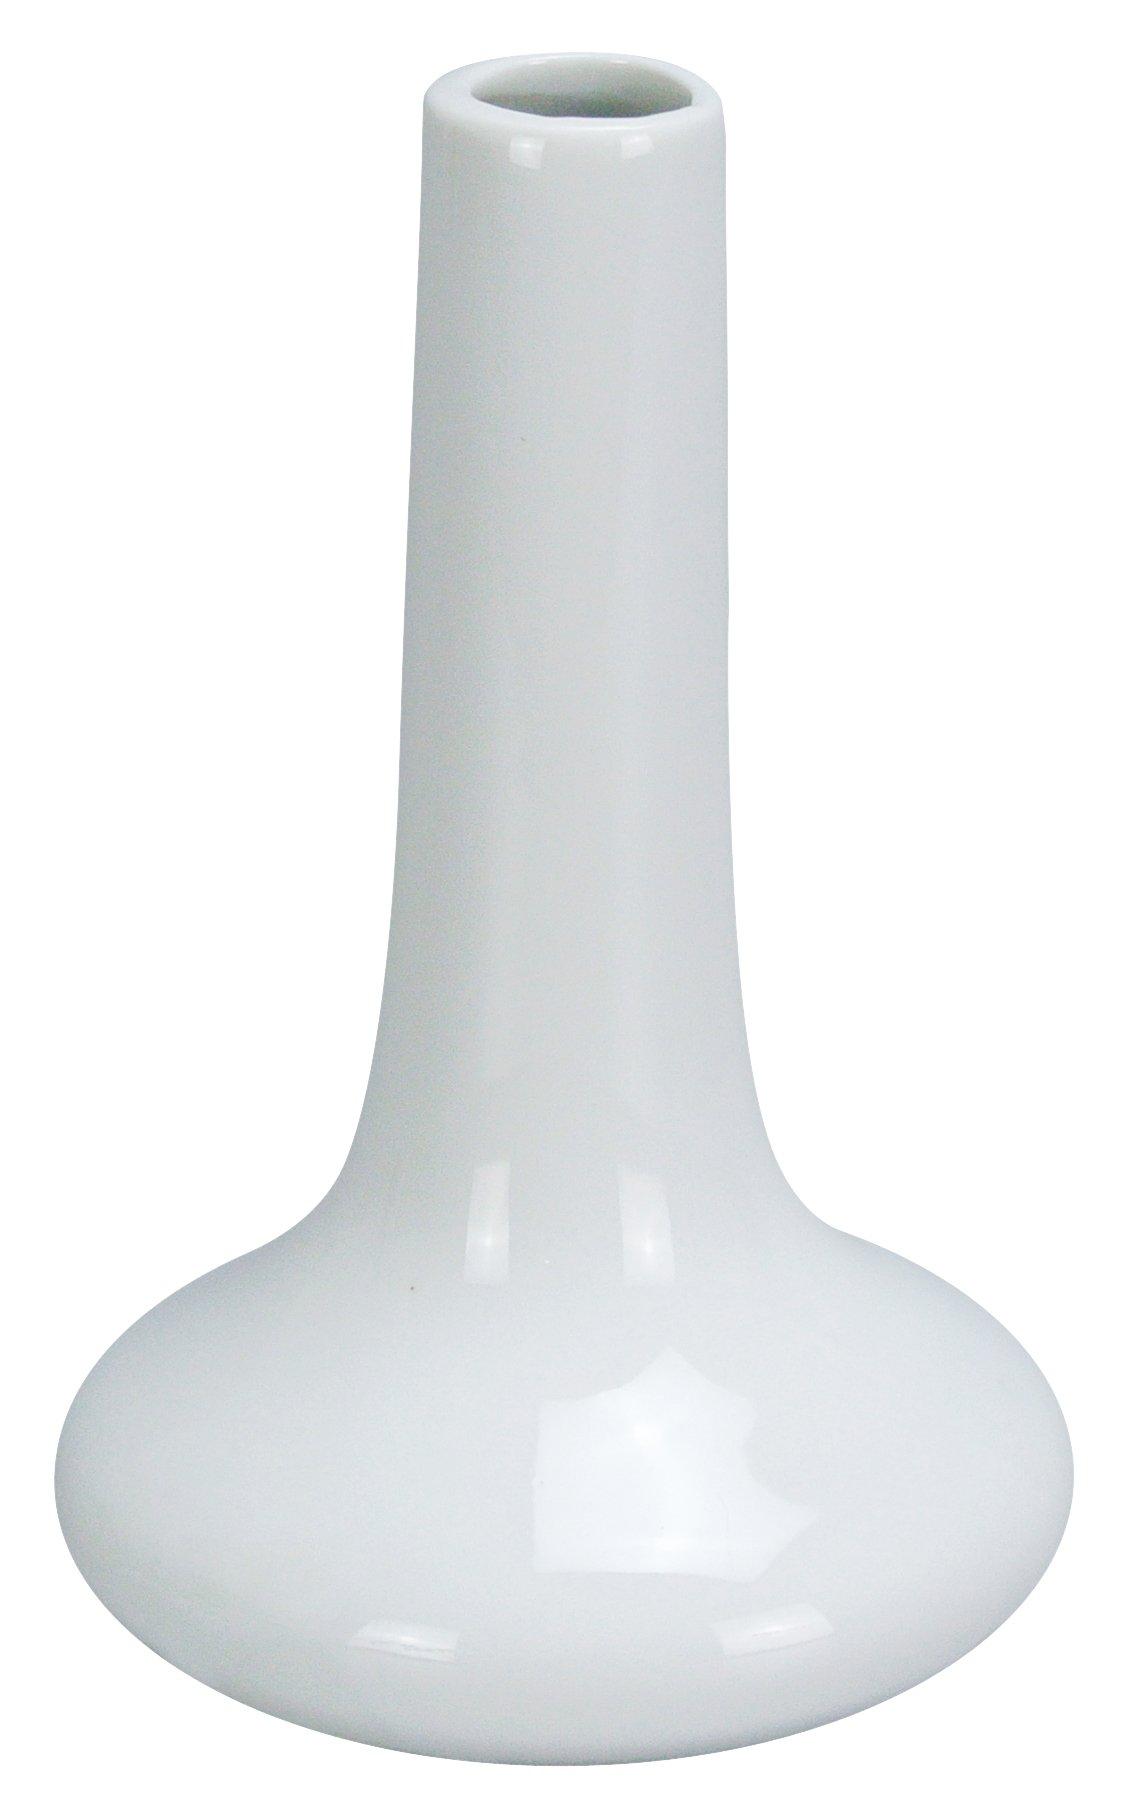 Yanco BV-1 Bud Vase, 6'' Height, Porcelain, Super White Color, Pack of 36 by Yanco (Image #1)